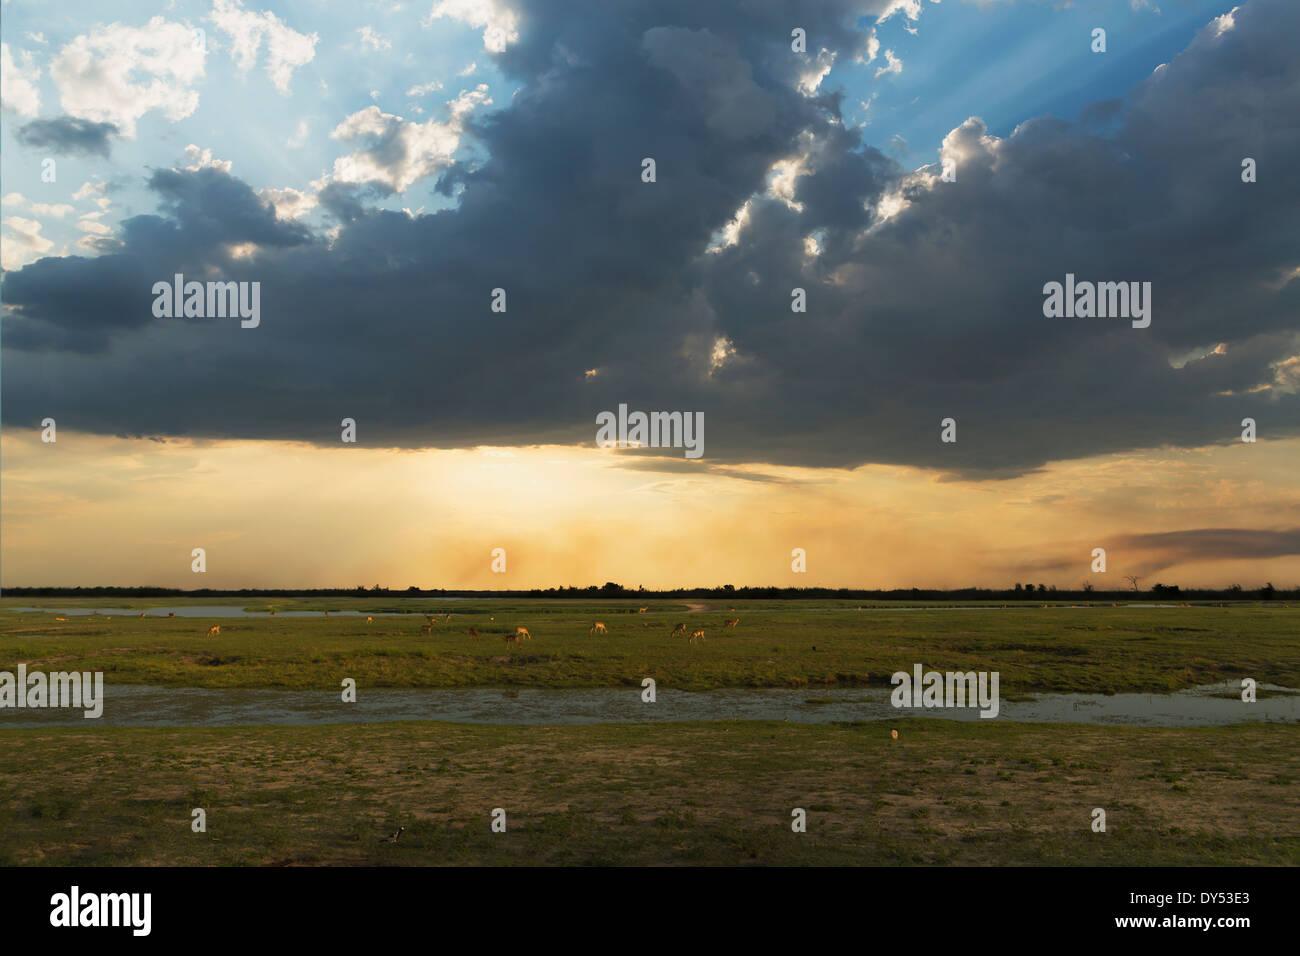 Swampland, Kasane, Chobe National Park, Botswana, Africa - Stock Image